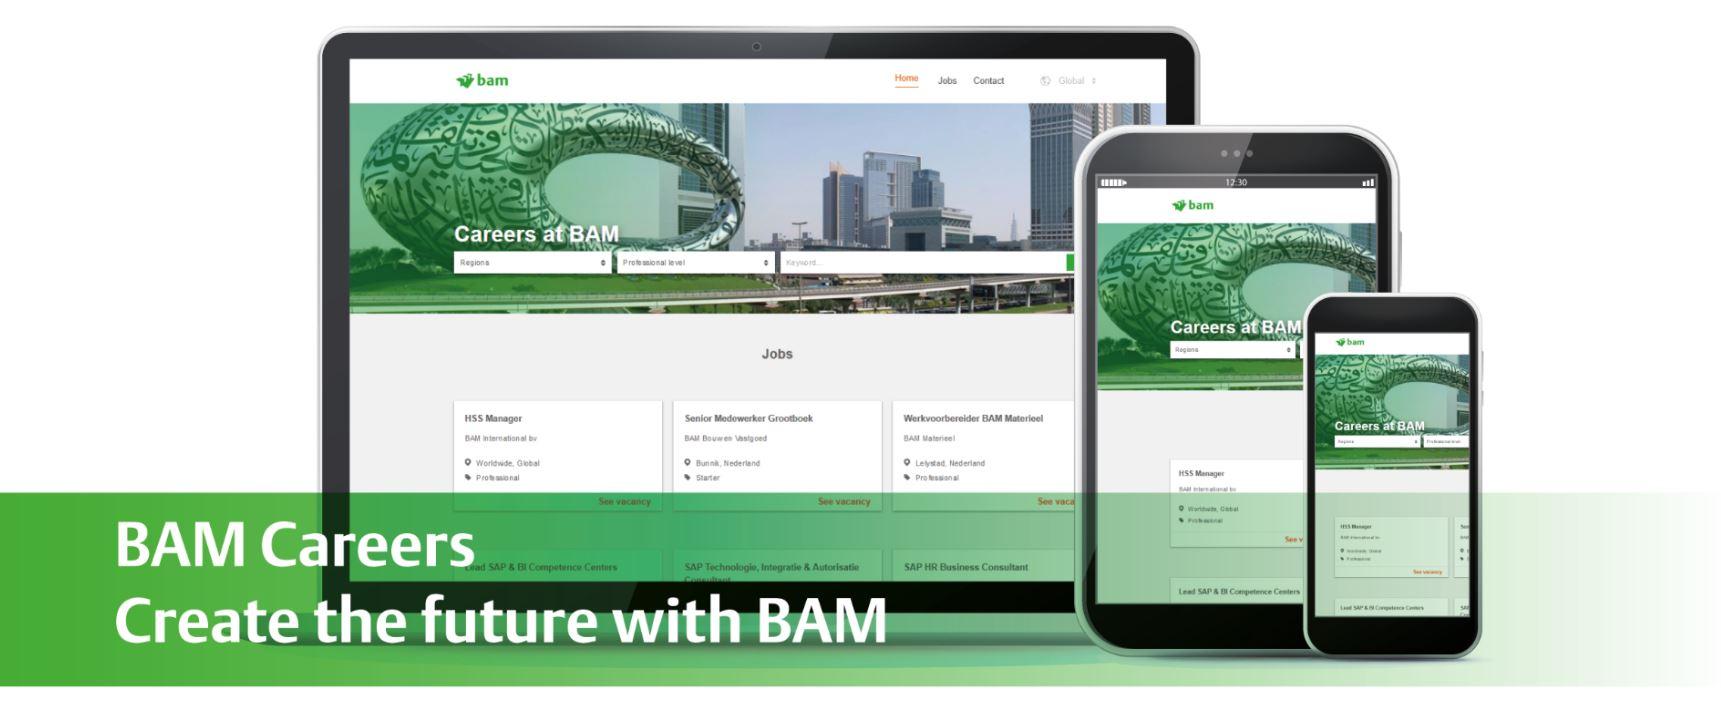 bam careers site